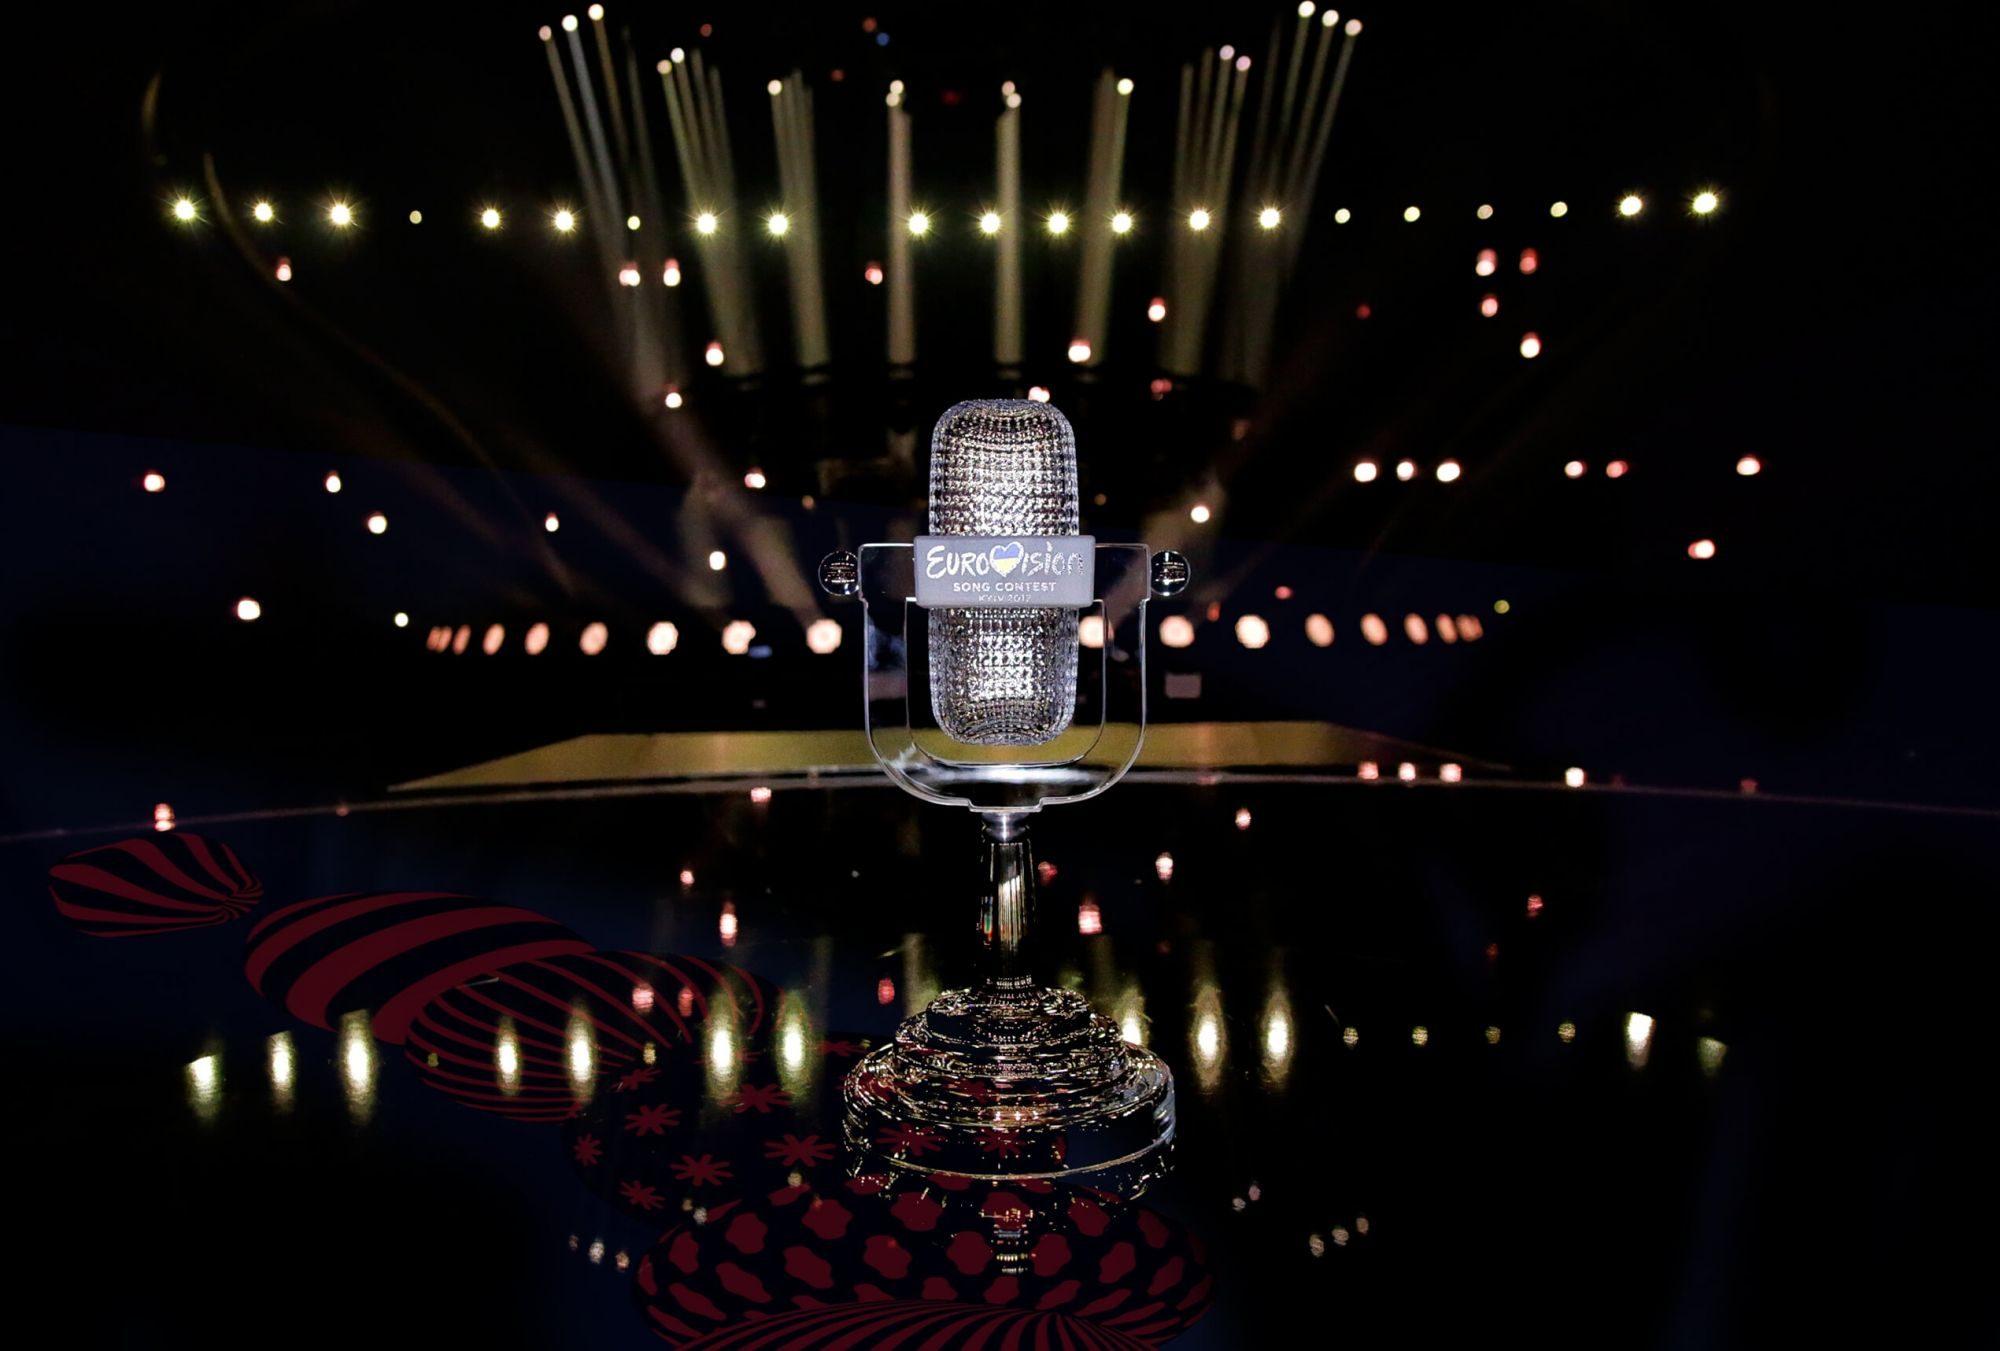 mega-cabecera__25052017_063118_eurovision-2017-trophy-by-thomas-hanses1